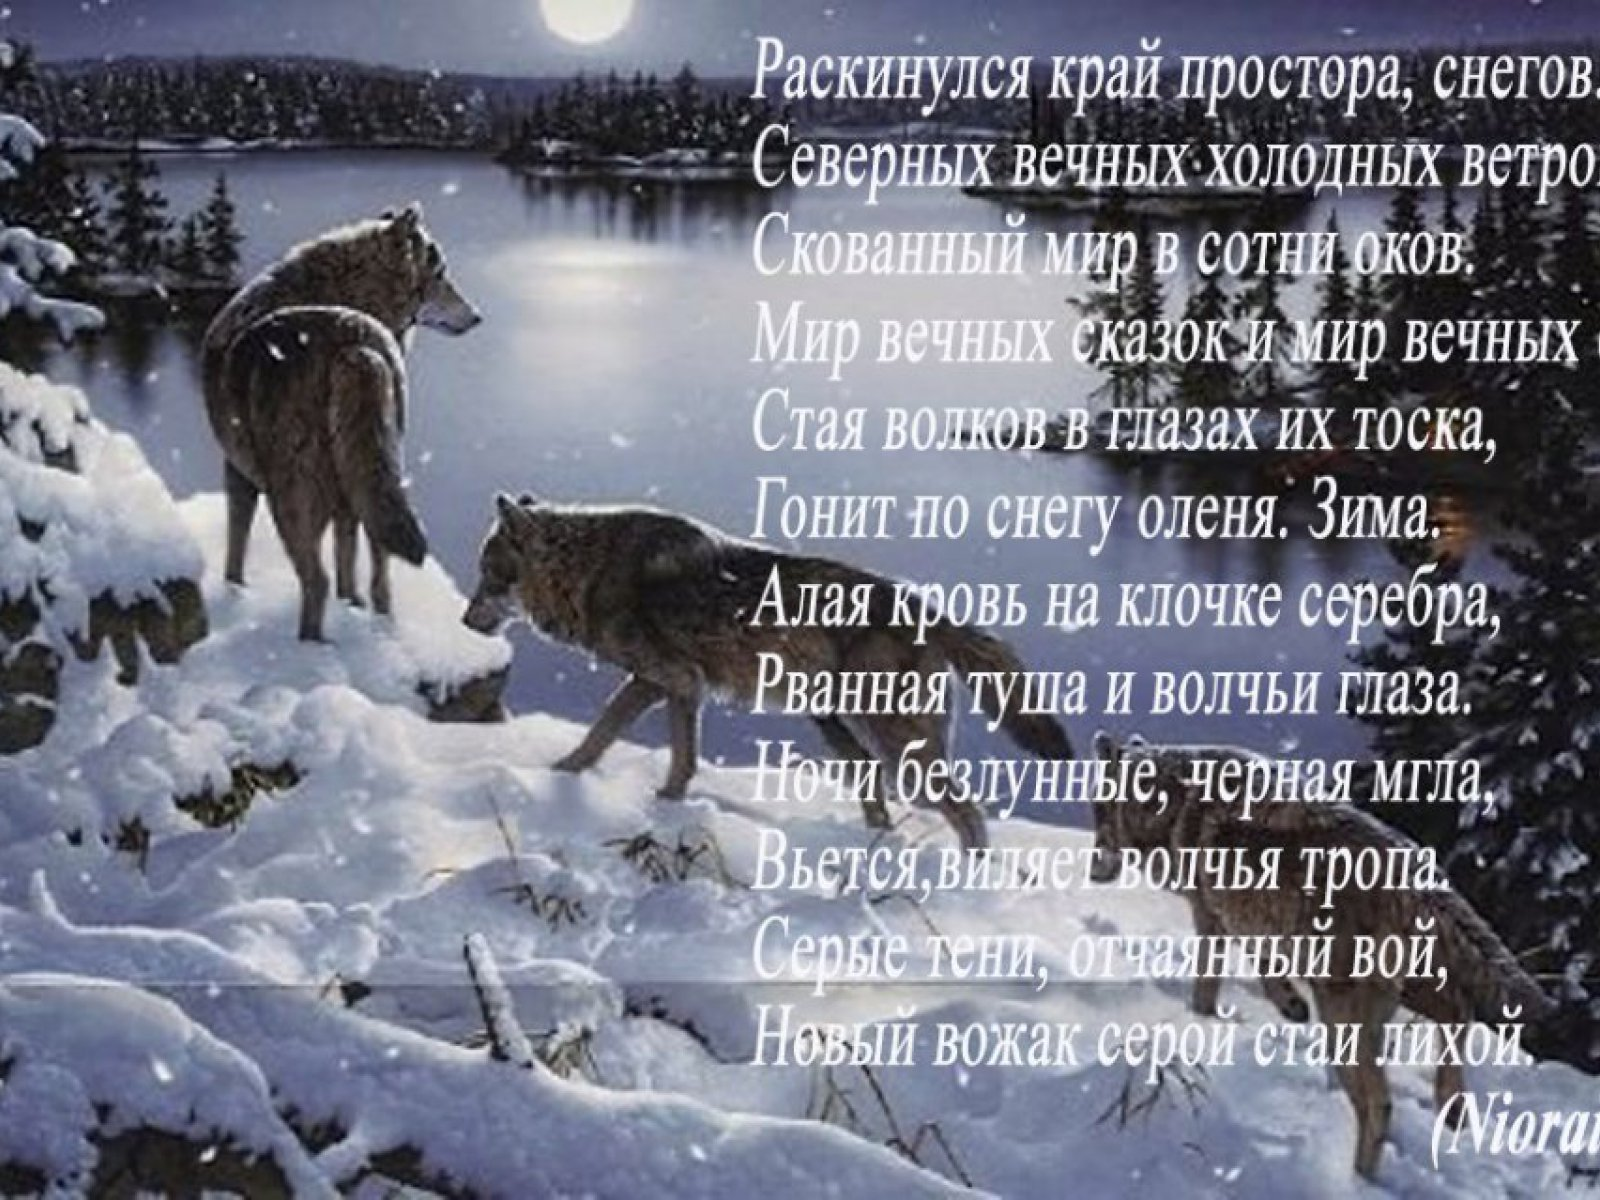 картинки зима со стихами про жизнь люди часто задаются